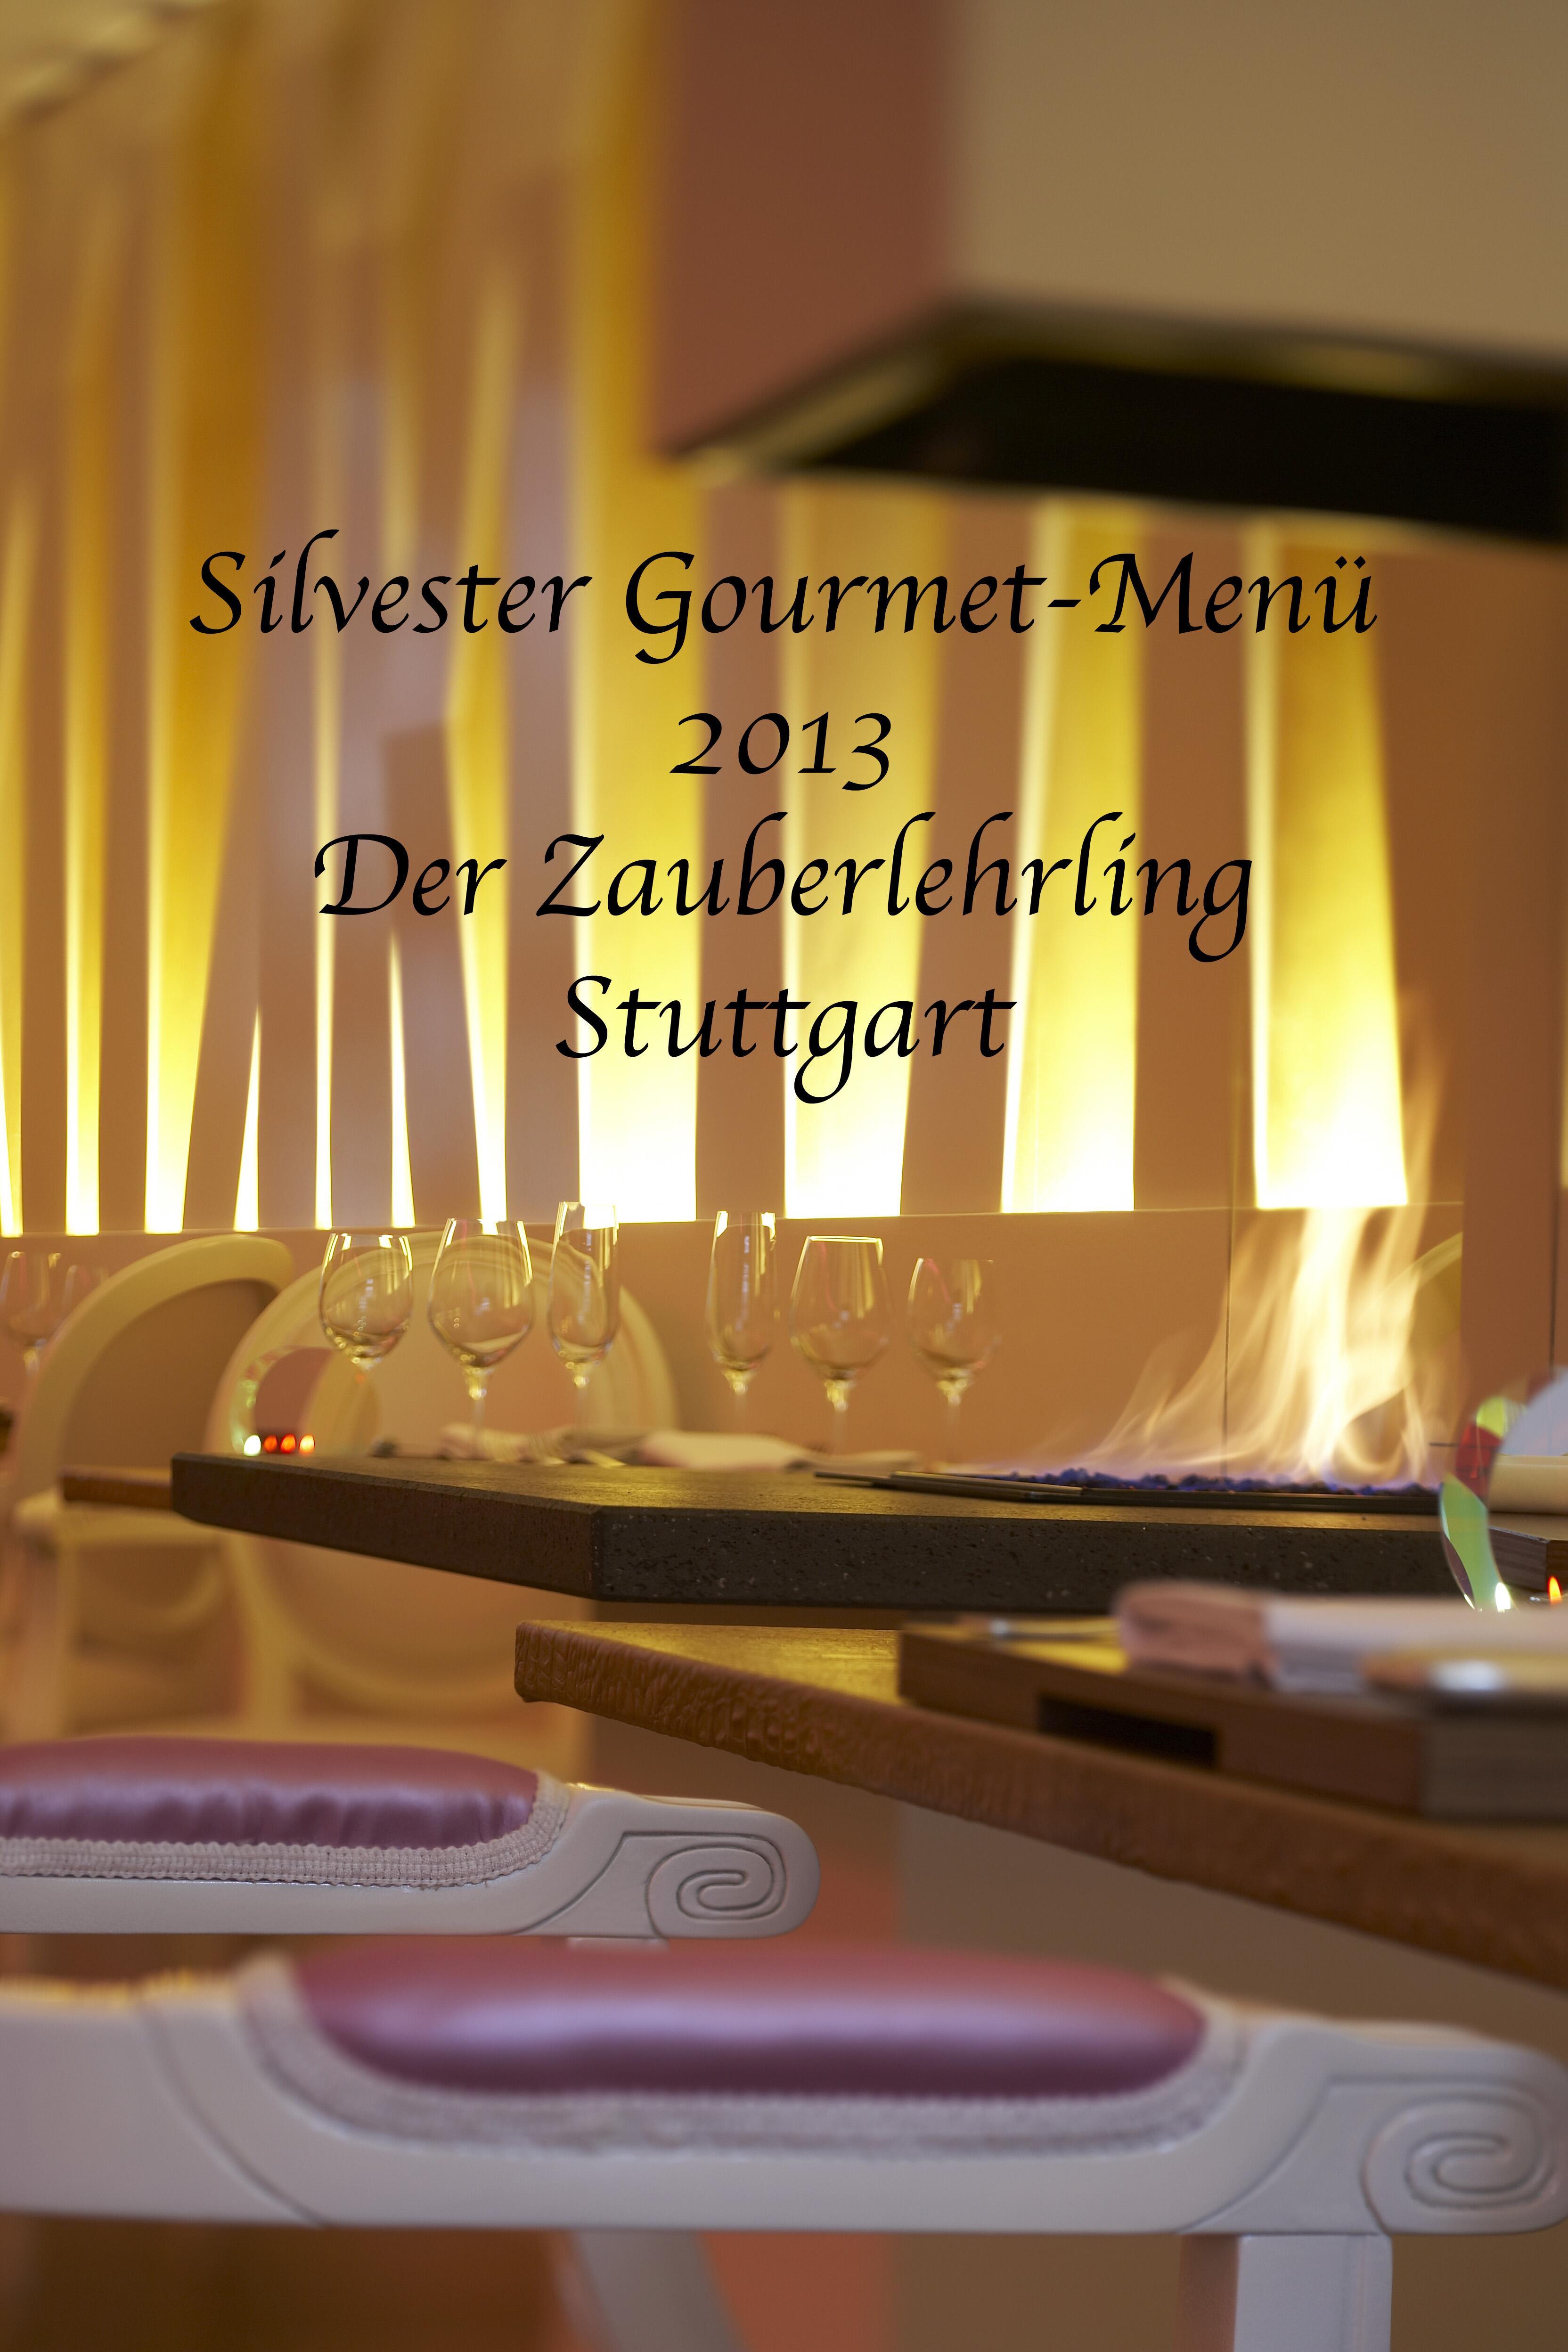 silvester gourmet men im zauberlehrling stuttgart silvester gourmet men 2013 designhotel. Black Bedroom Furniture Sets. Home Design Ideas